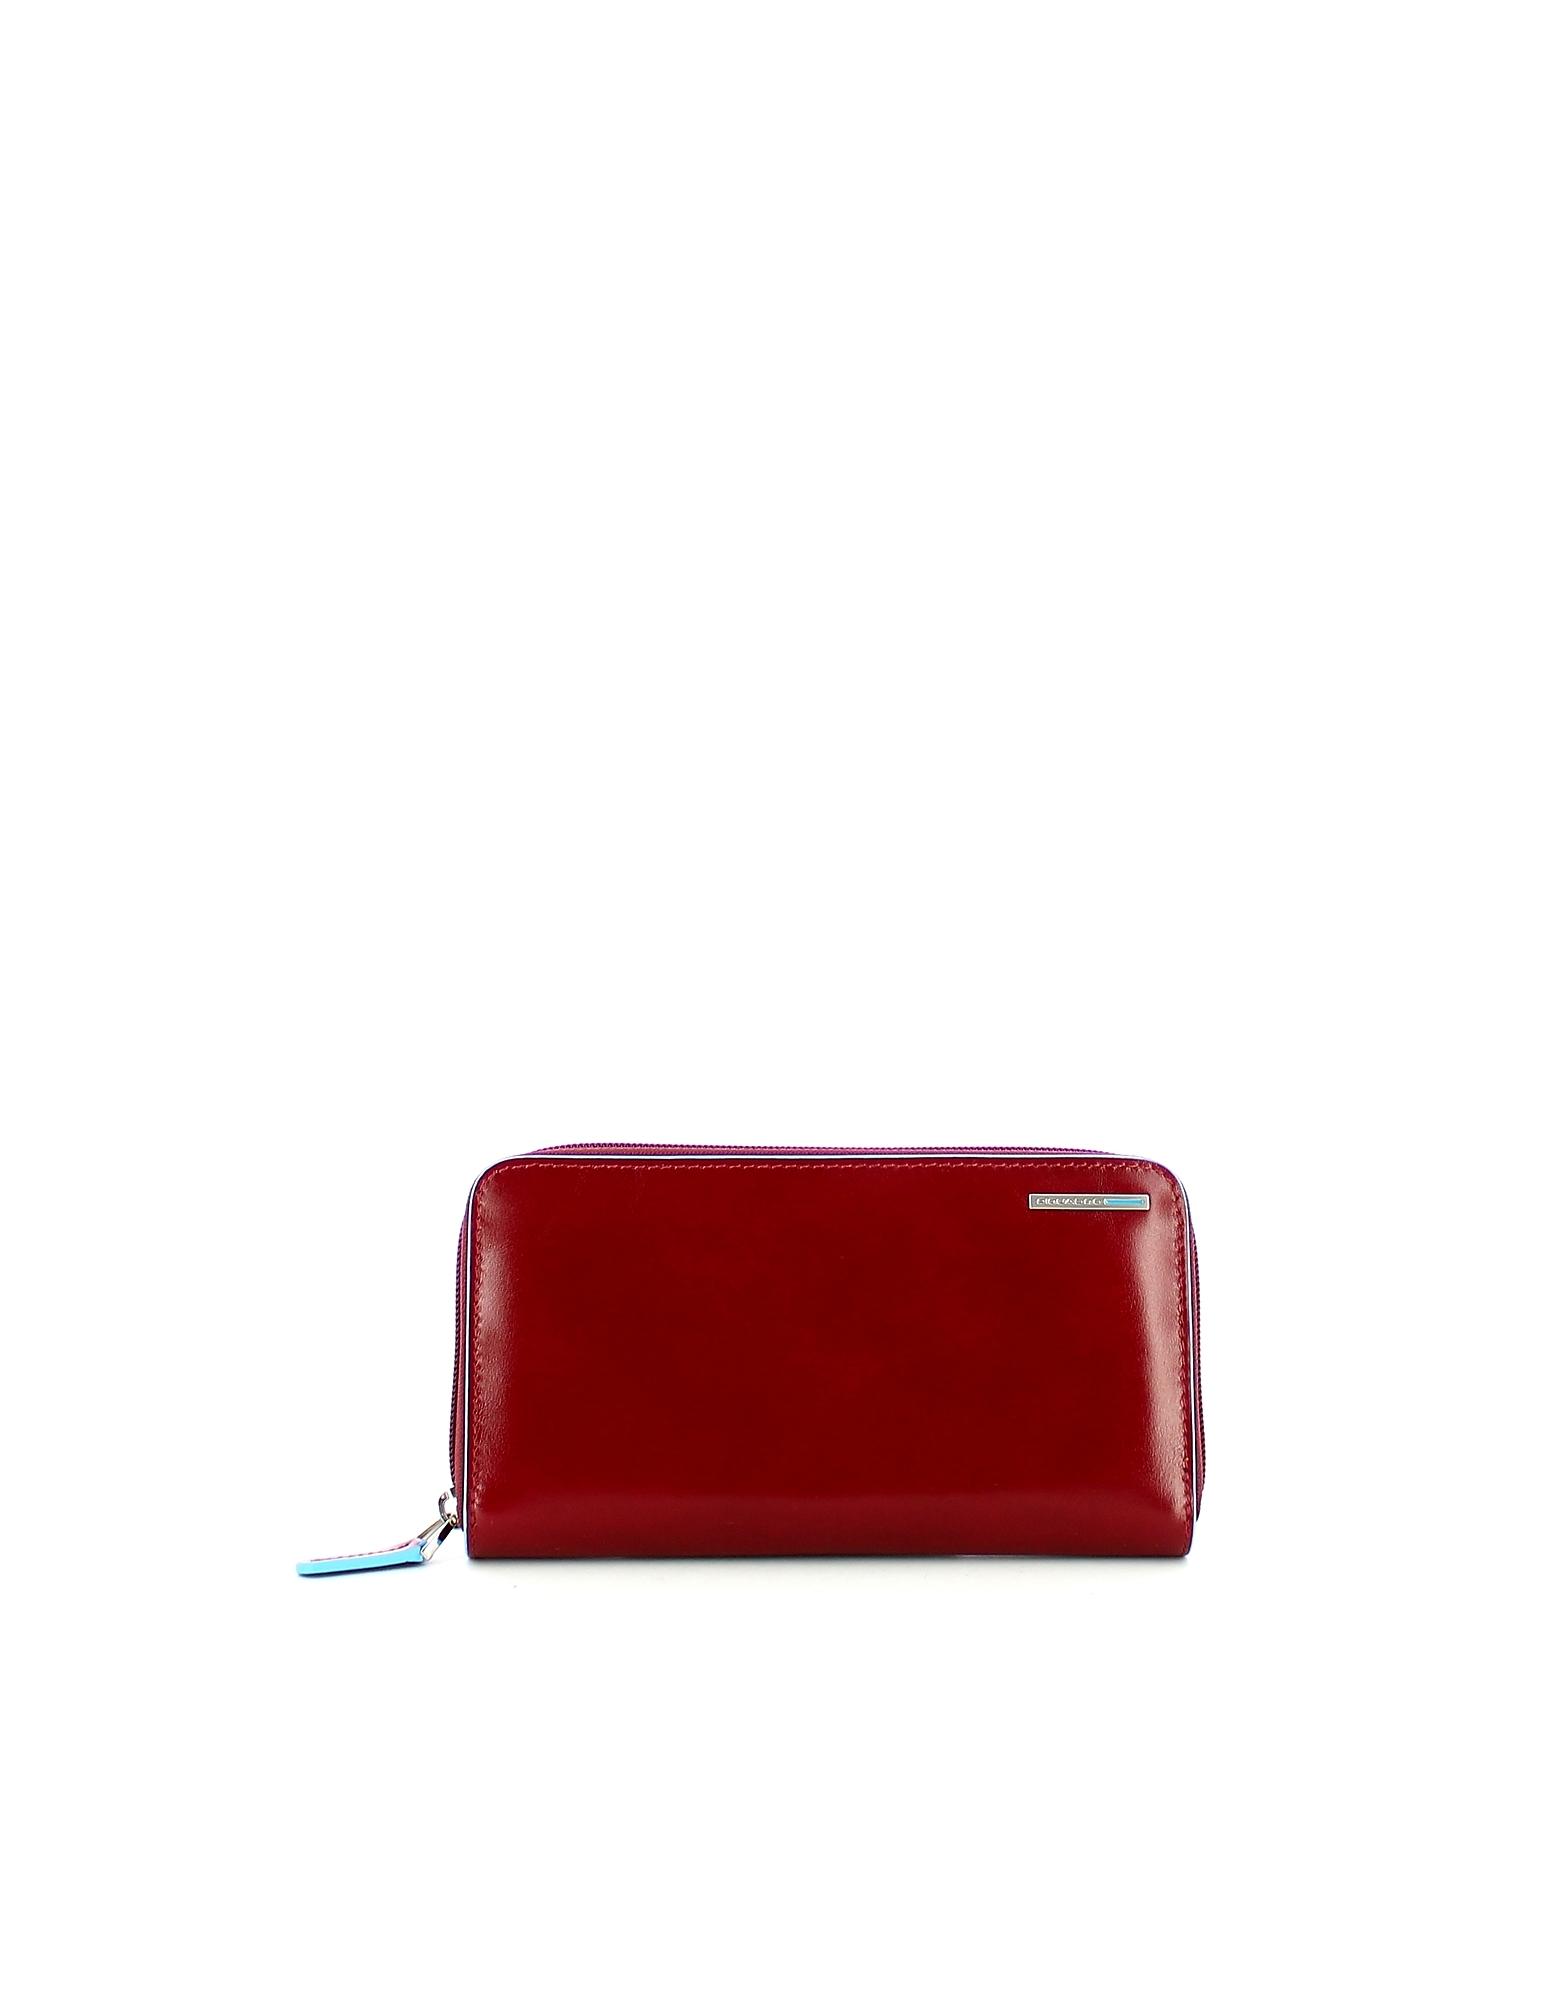 Piquadro Designer Wallets, Women's Red Wallet